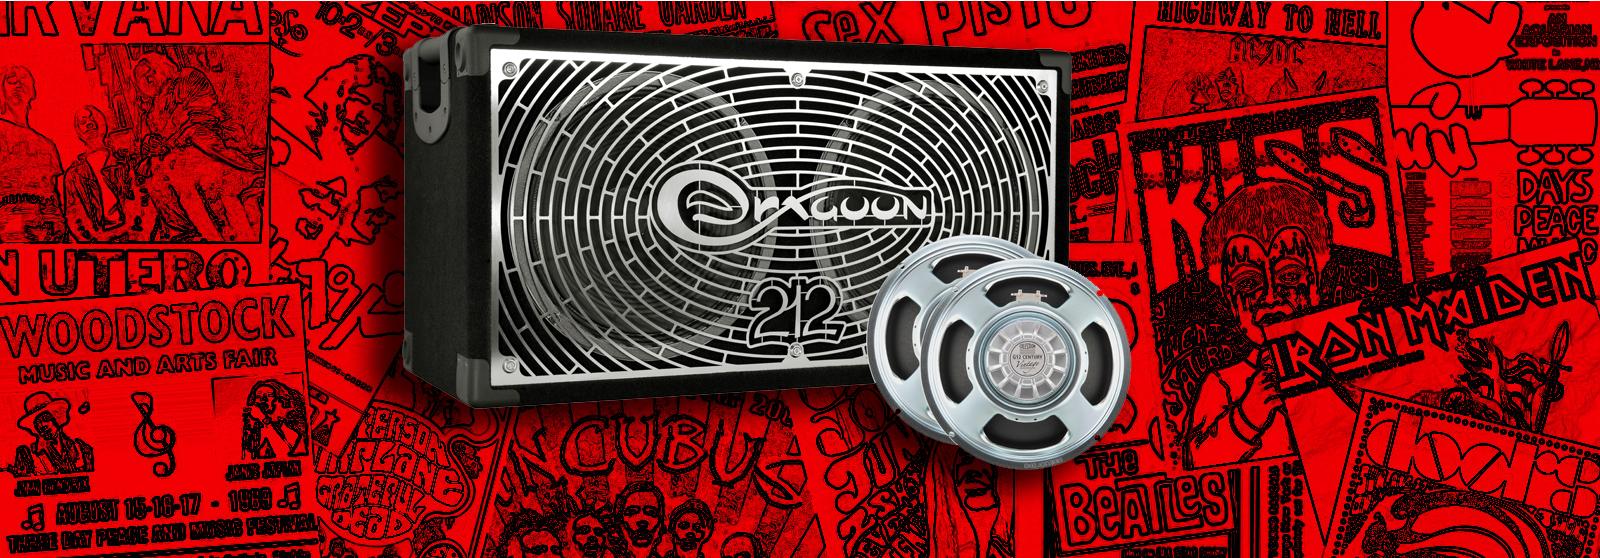 Dragoon - The Custom Speaker - DRAGOON-260C8CV_20160629201847605985.jpg